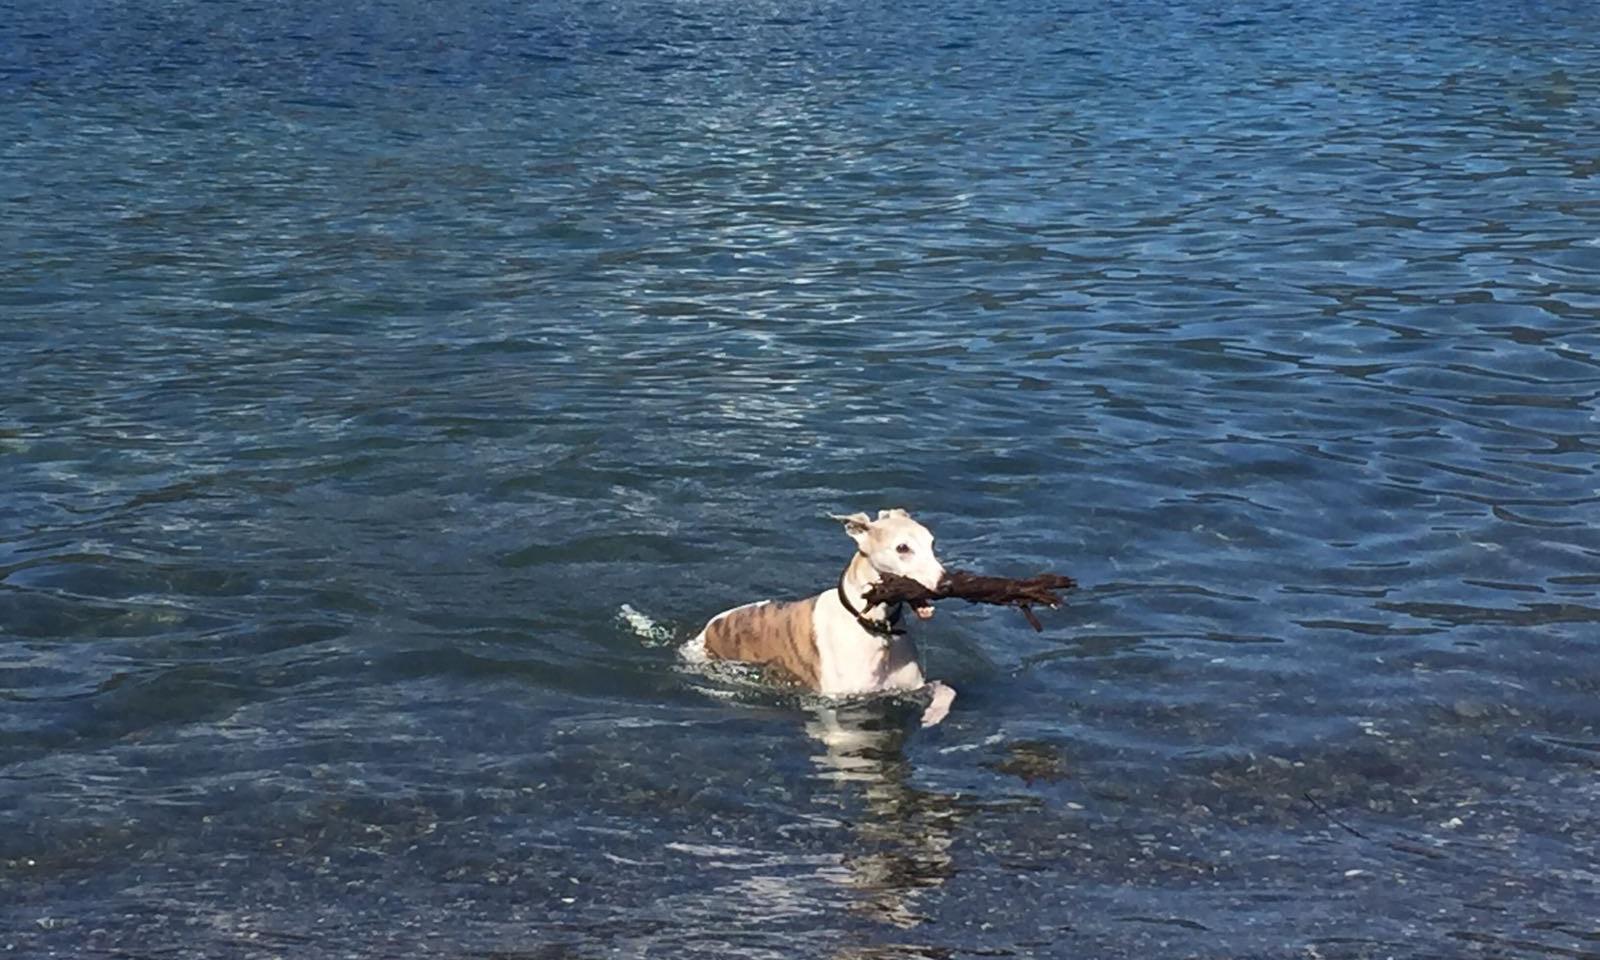 Marvin enjoying a swim.